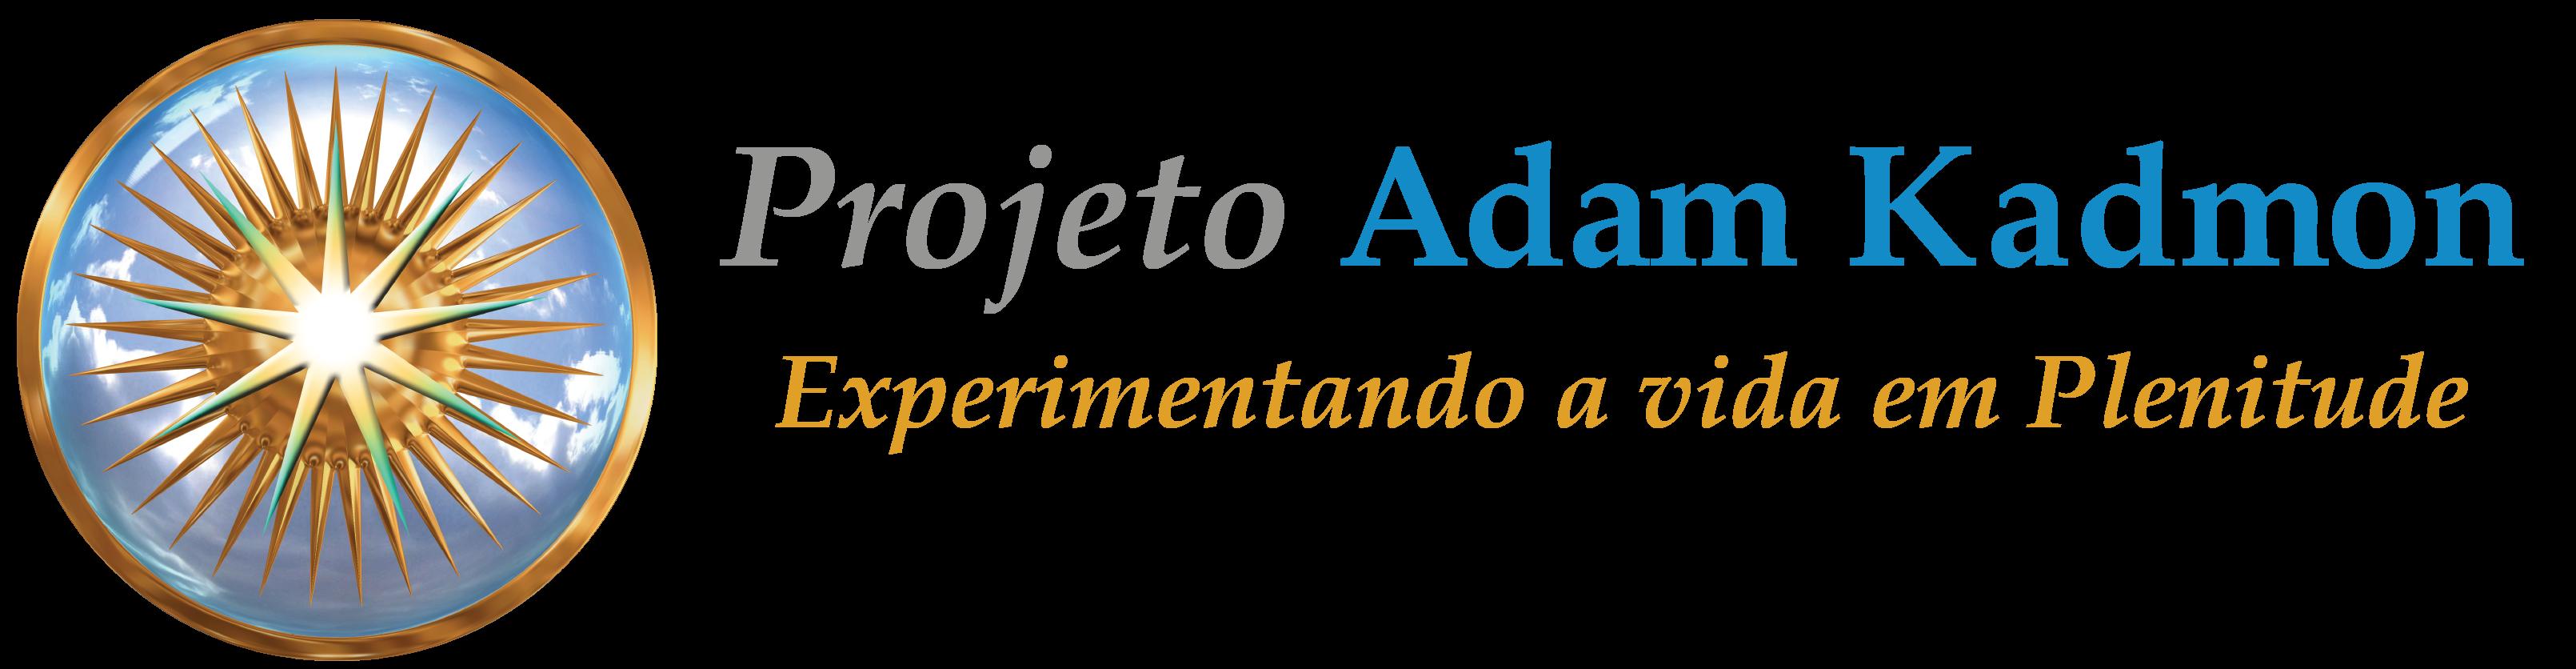 Projeto Adam Kadmon